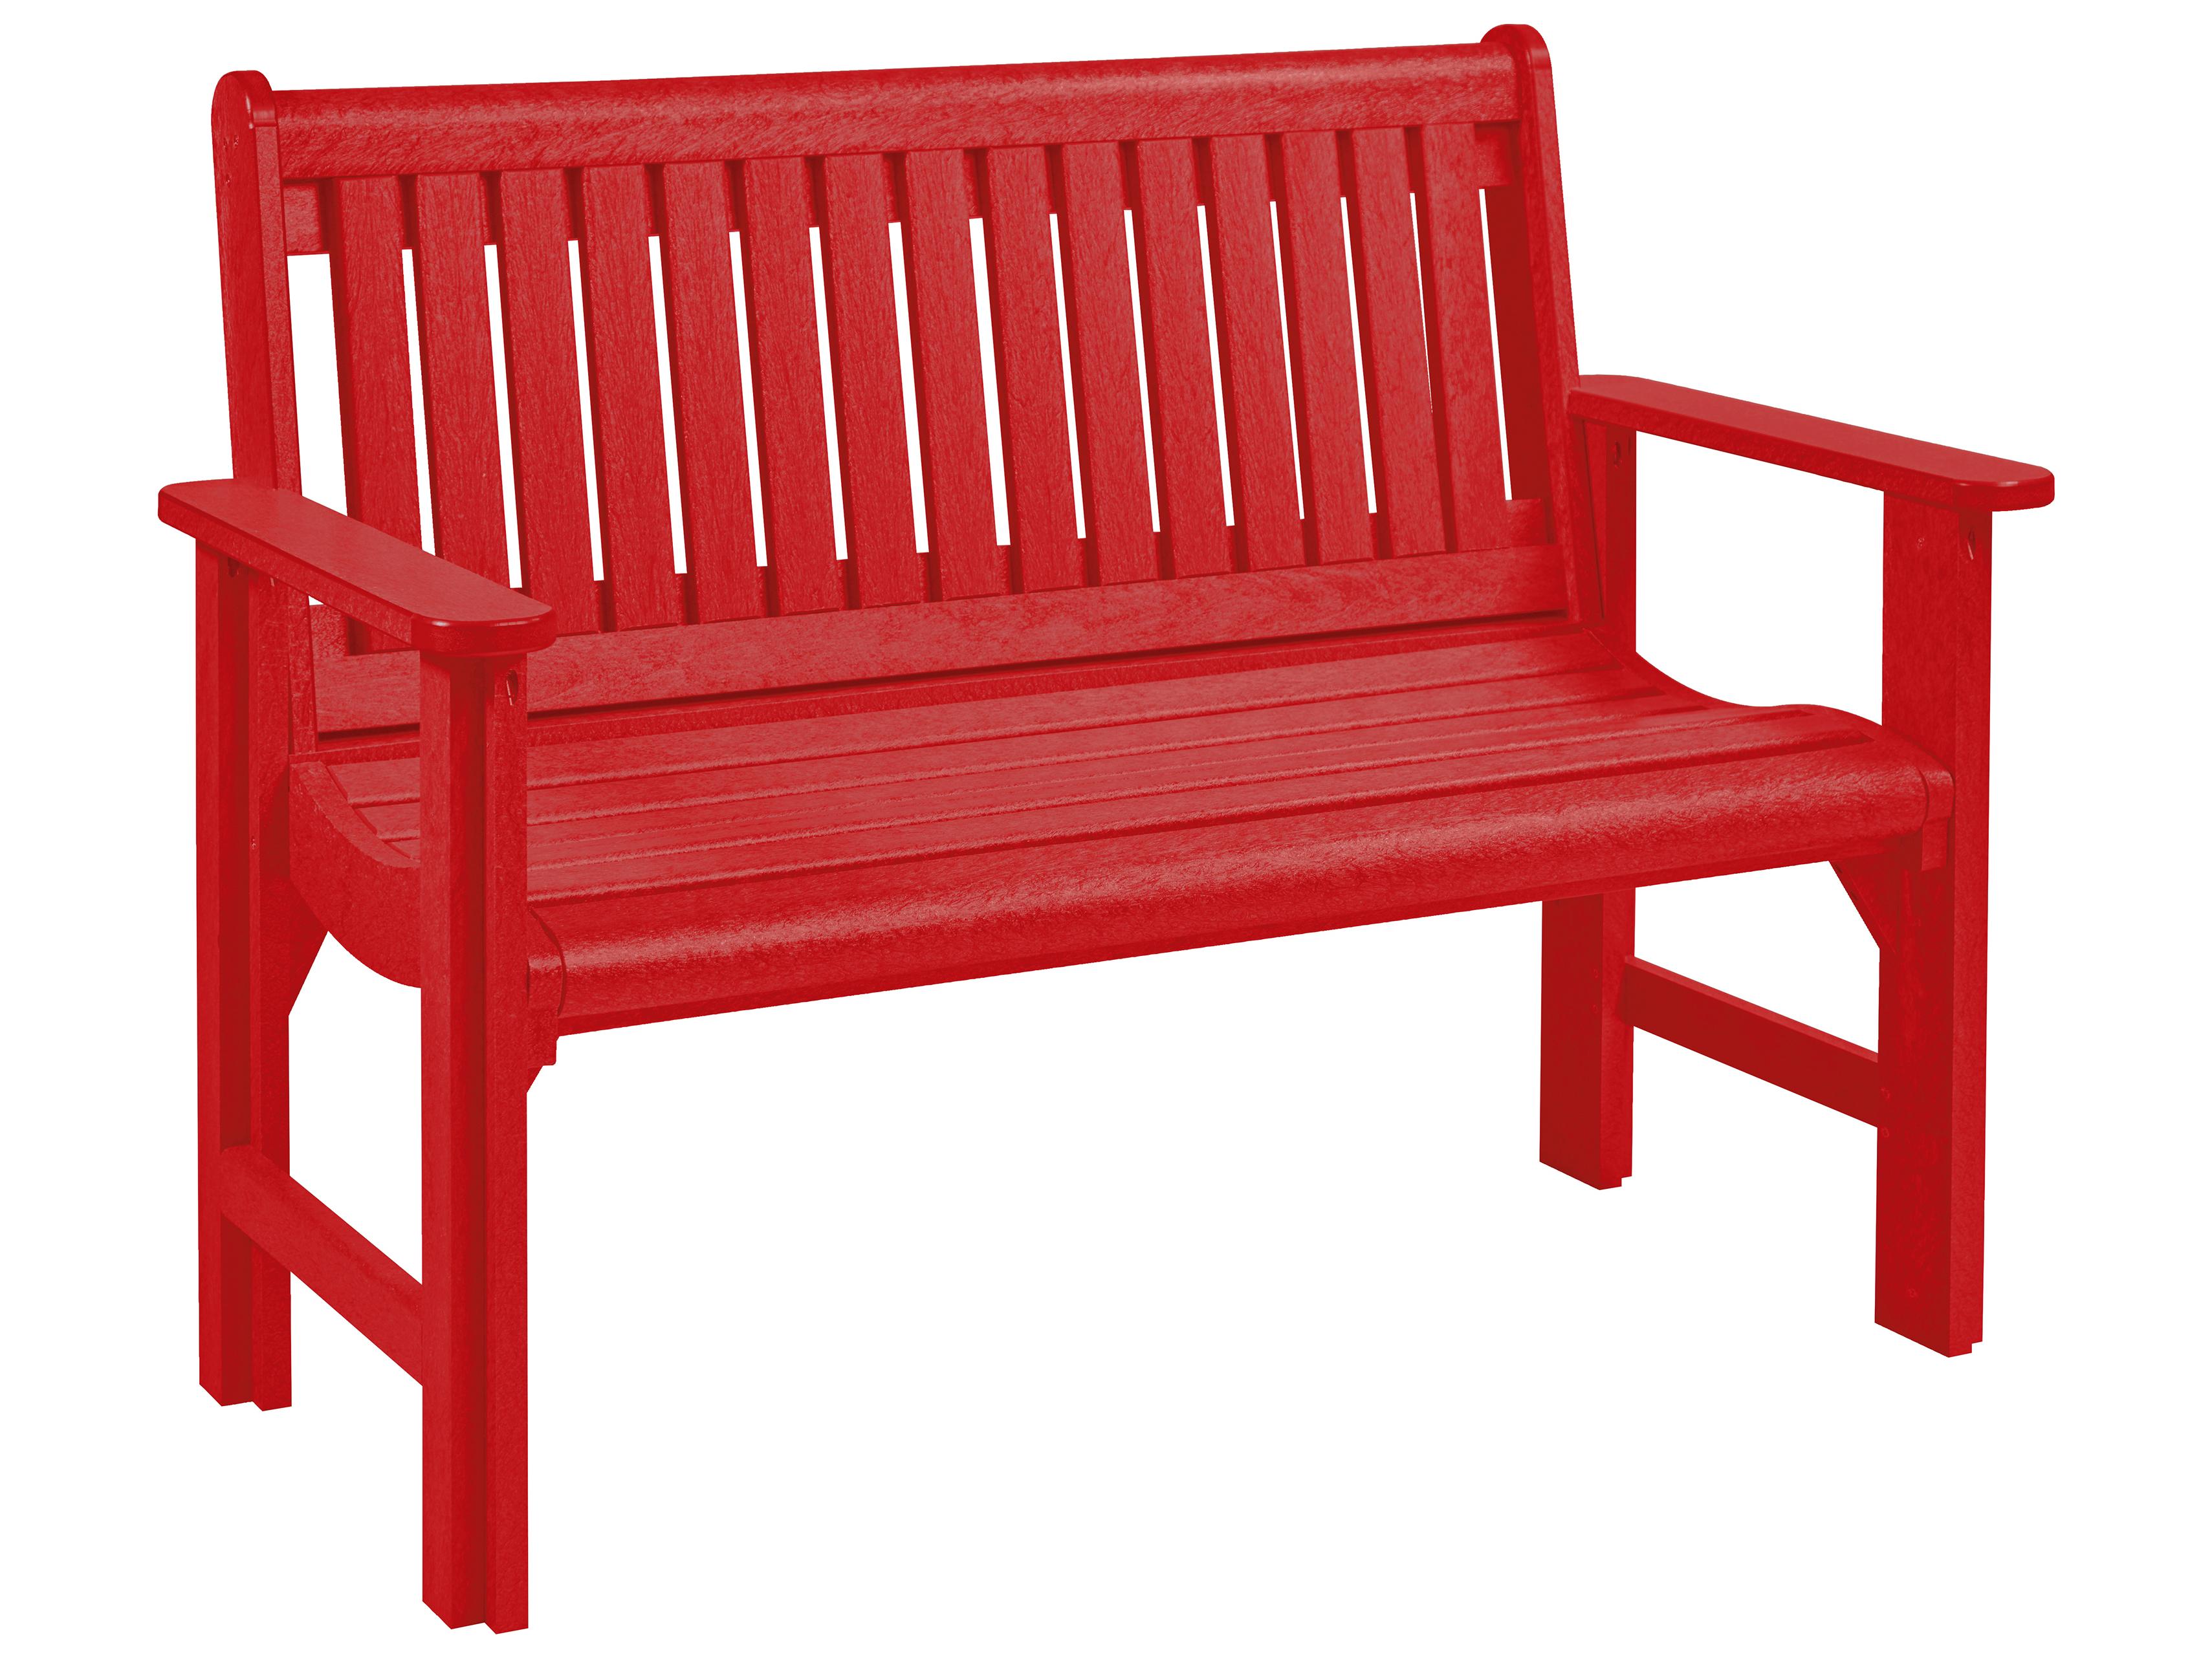 C R Plastic Generation Garden Bench B01